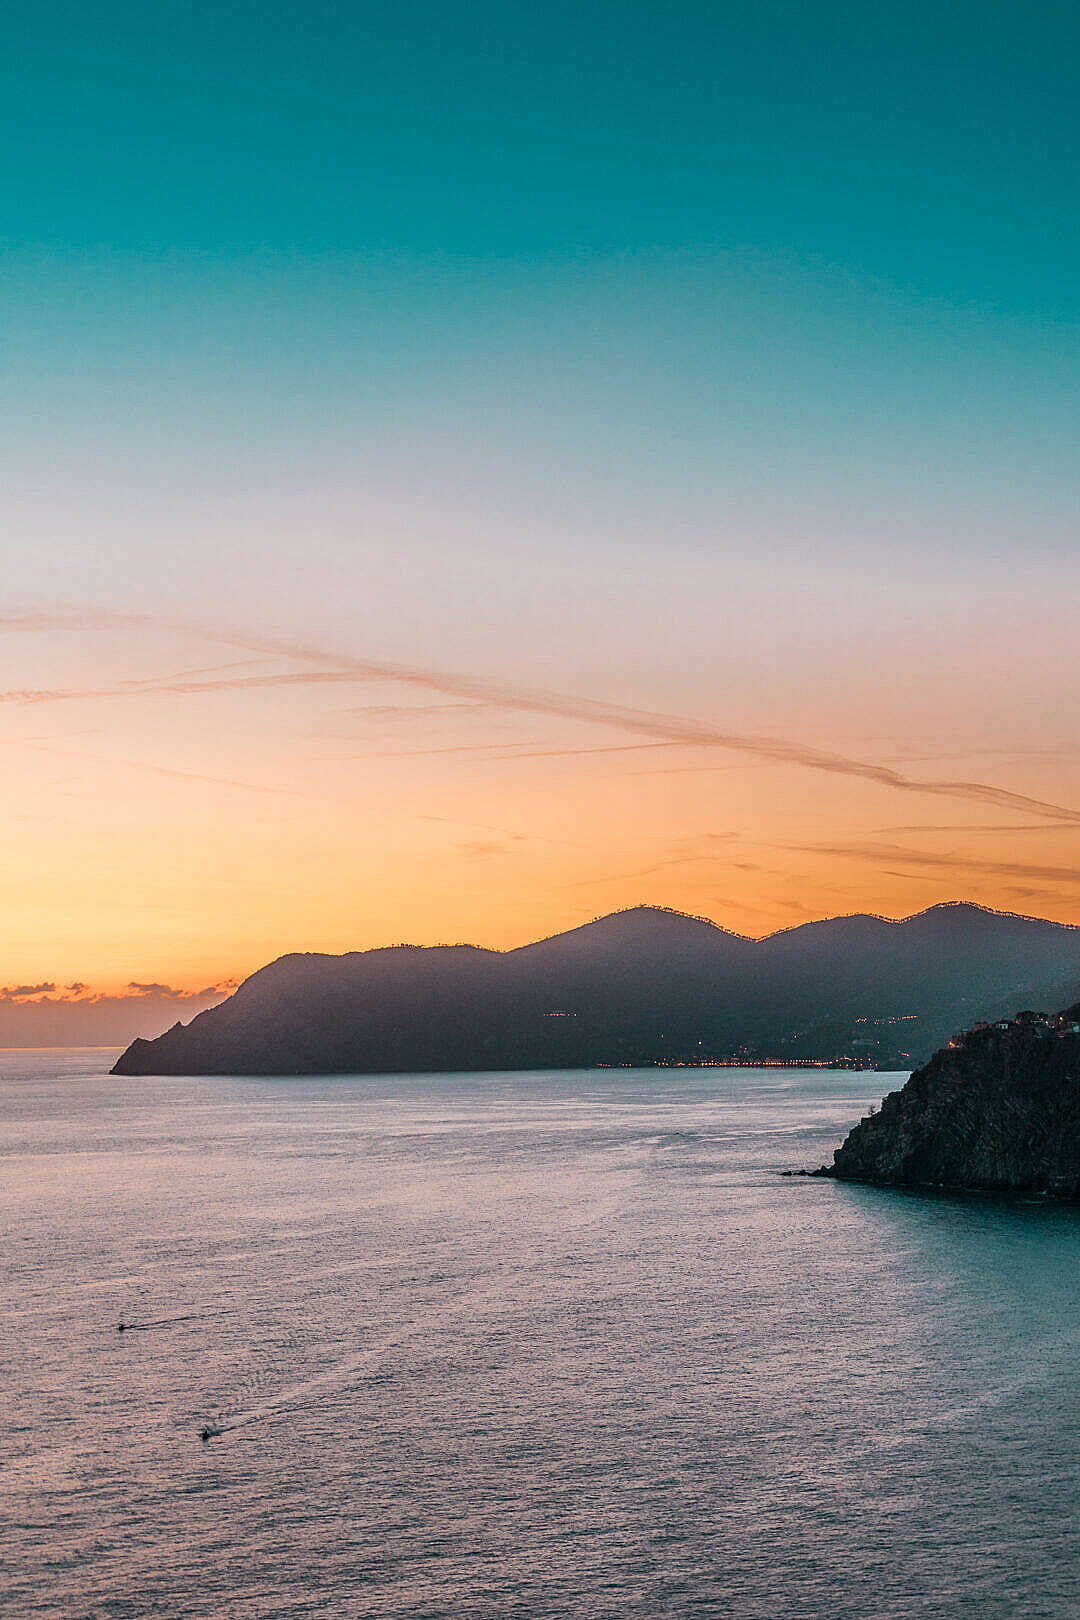 Download Italian Coastline in Sunset FREE Stock Photo